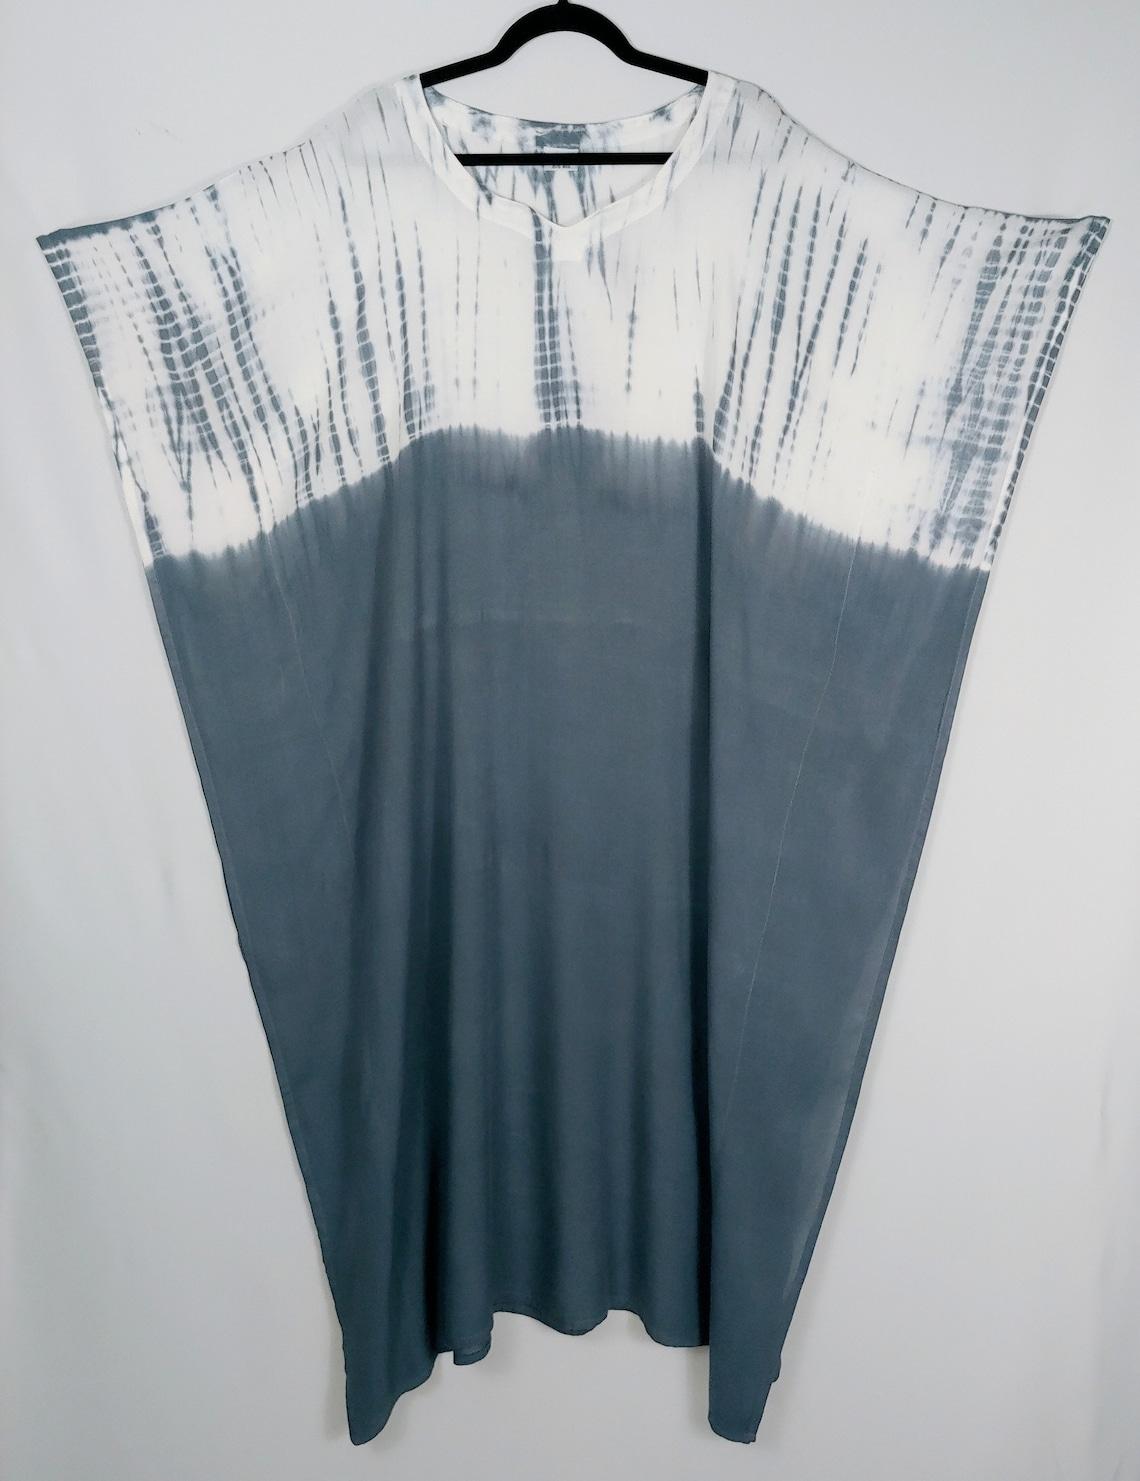 Tie Dye. Kaftans. Caftan. Kaftans for women. Caftans. Kaftan